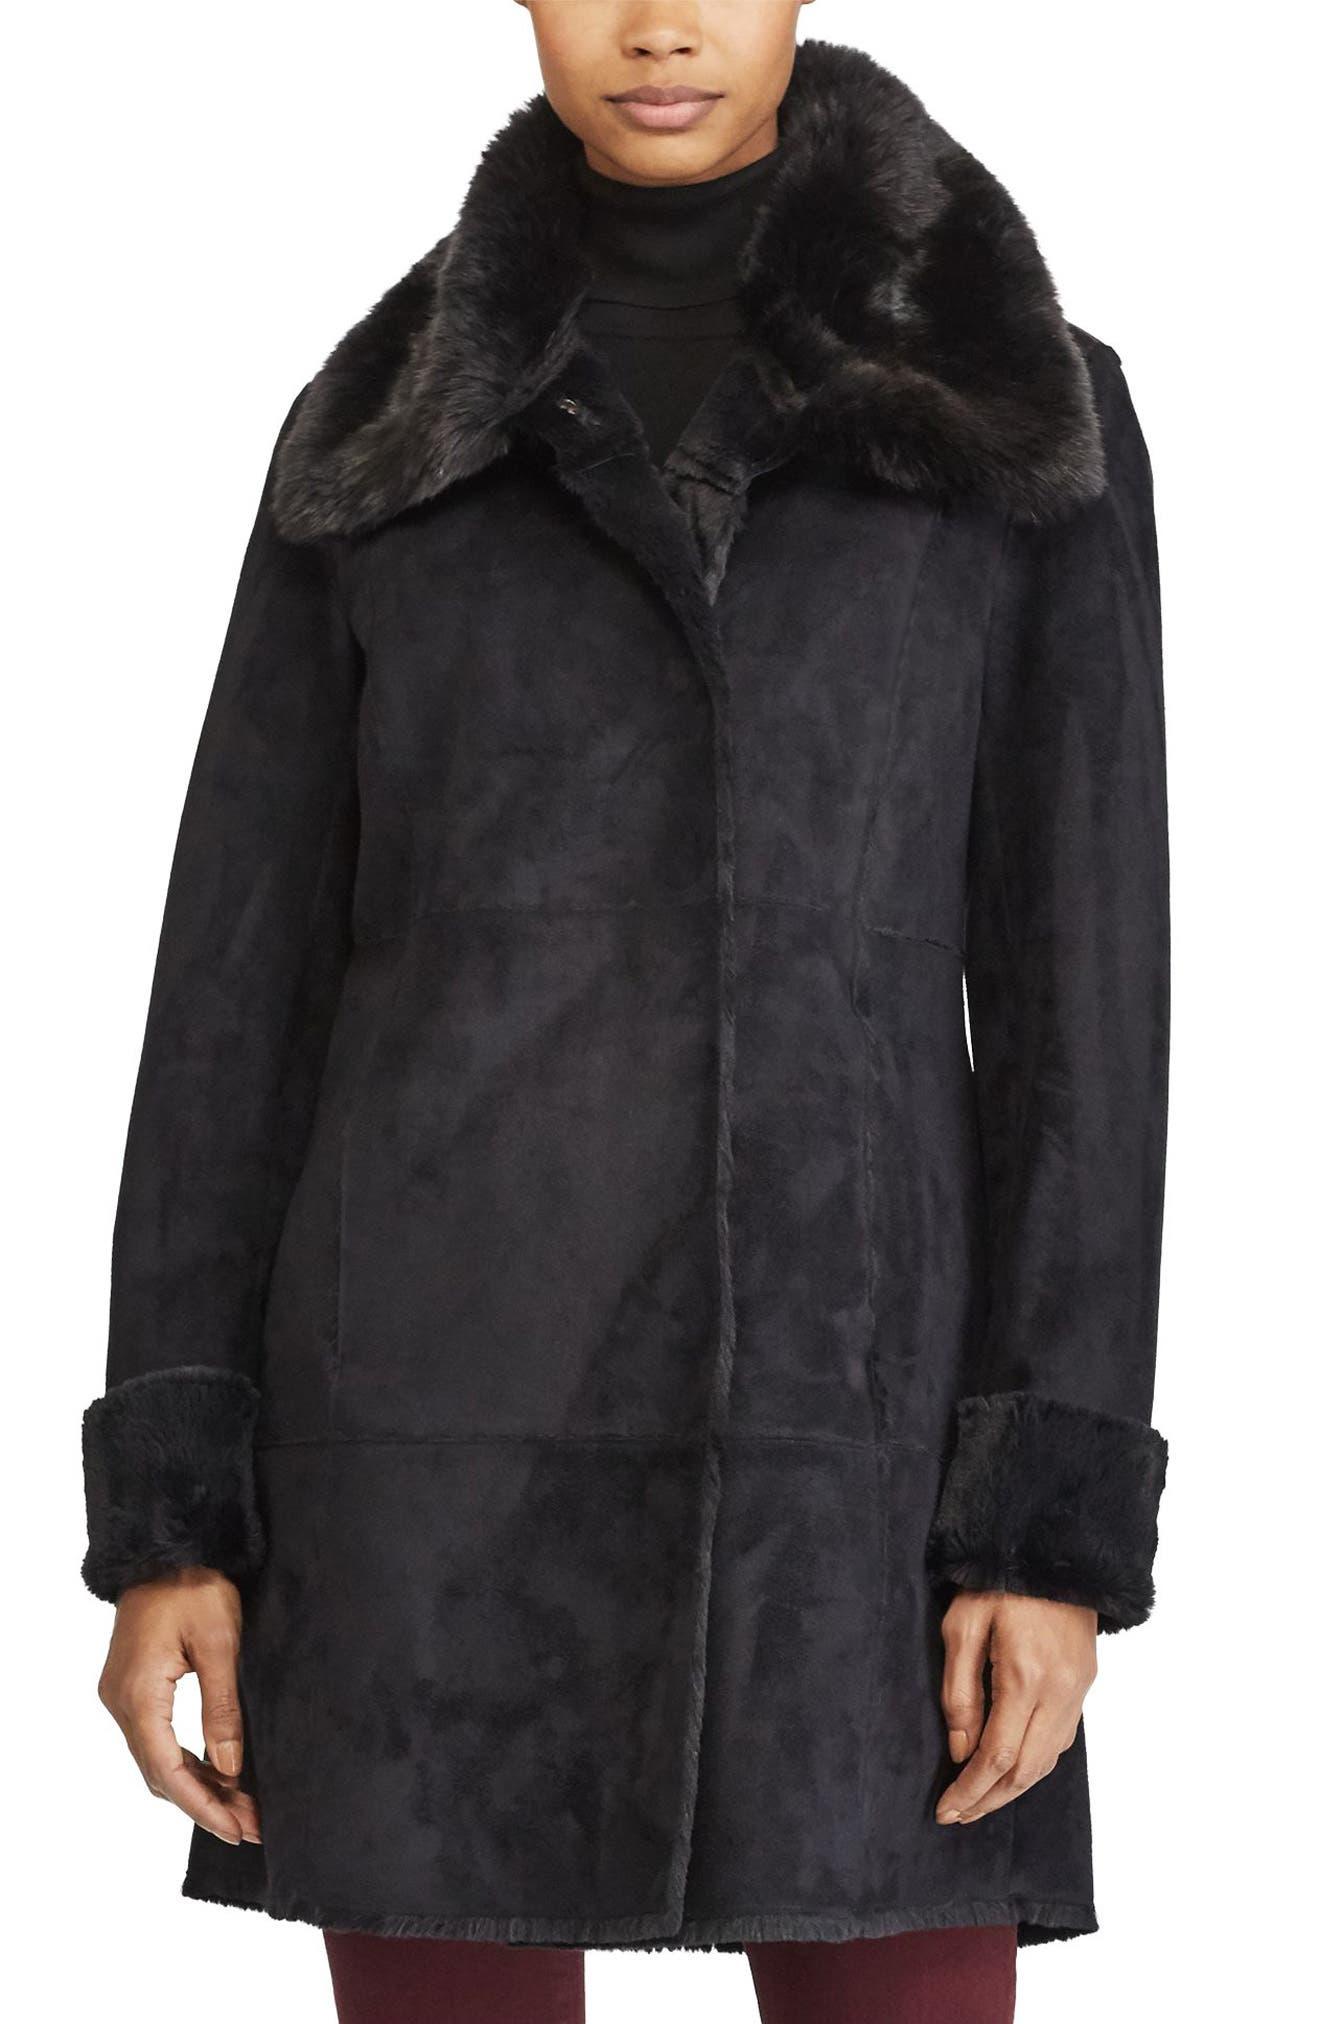 LAUREN RALPH LAUREN Faux Shearling Jacket, Main, color, 001